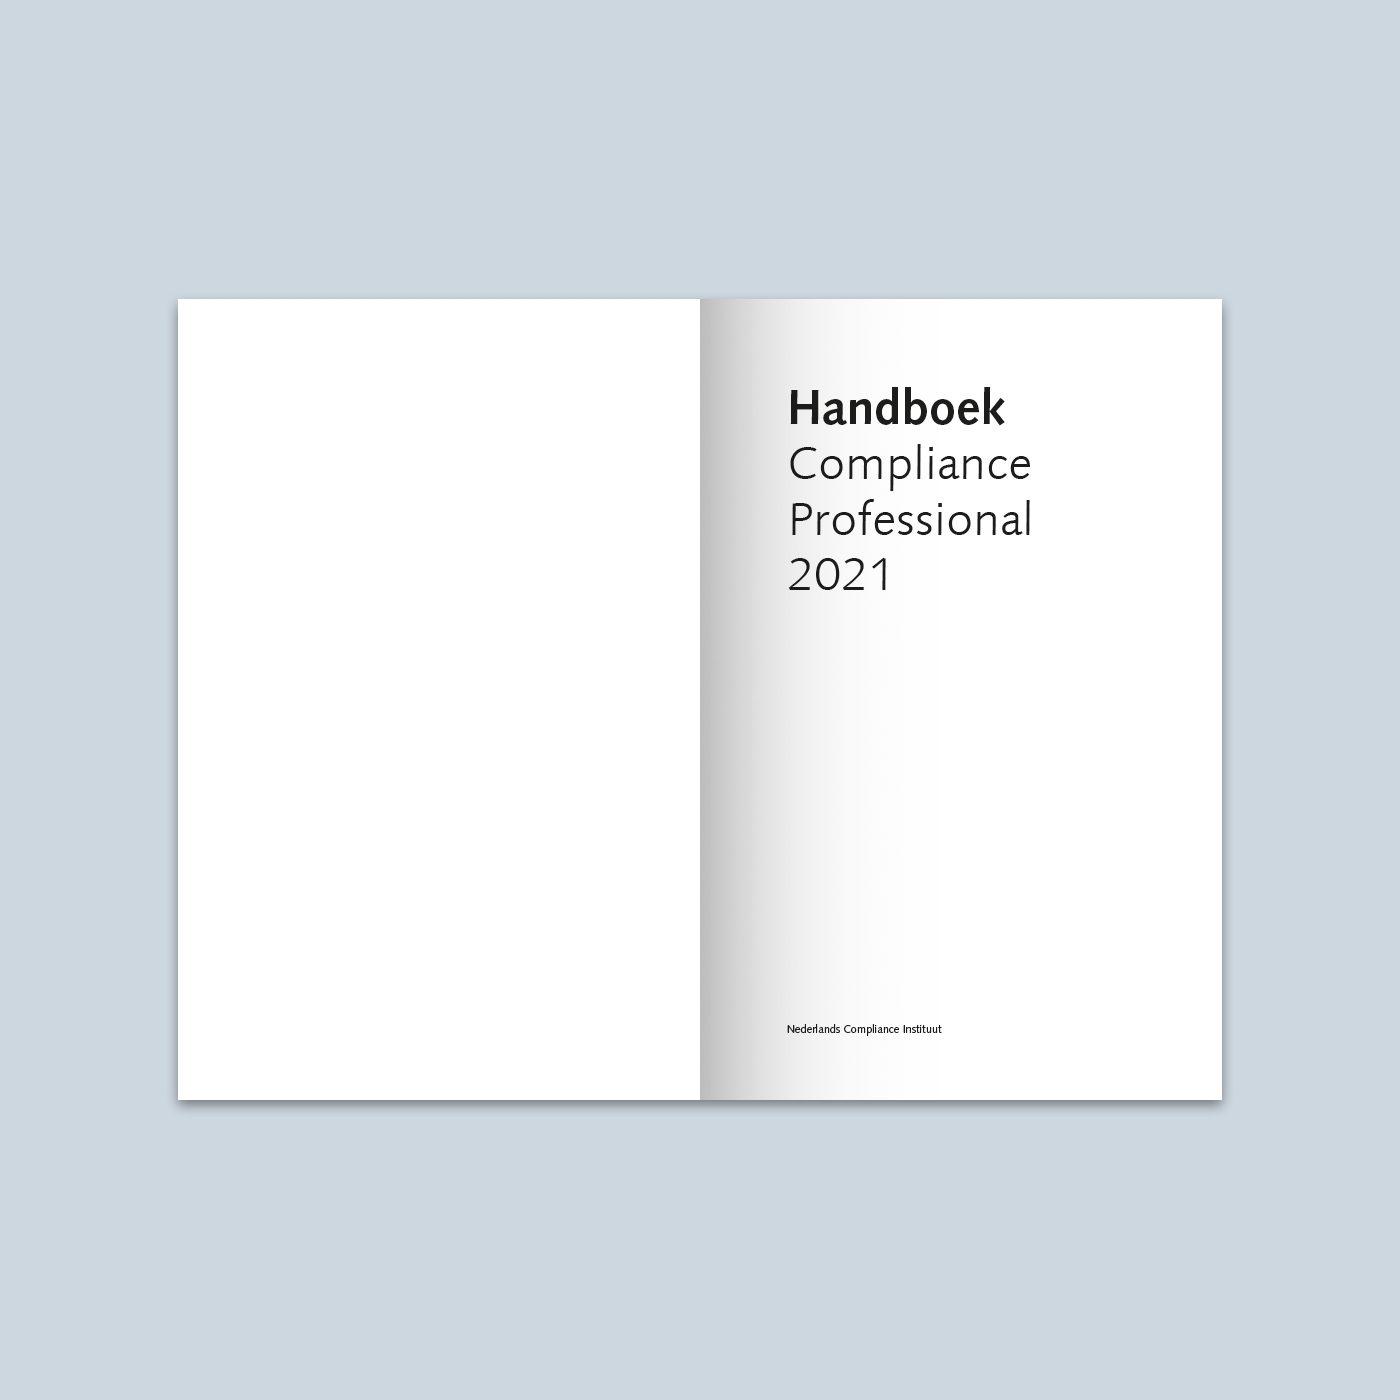 Handboek Compliance Professional 2021 binnenwerk 1